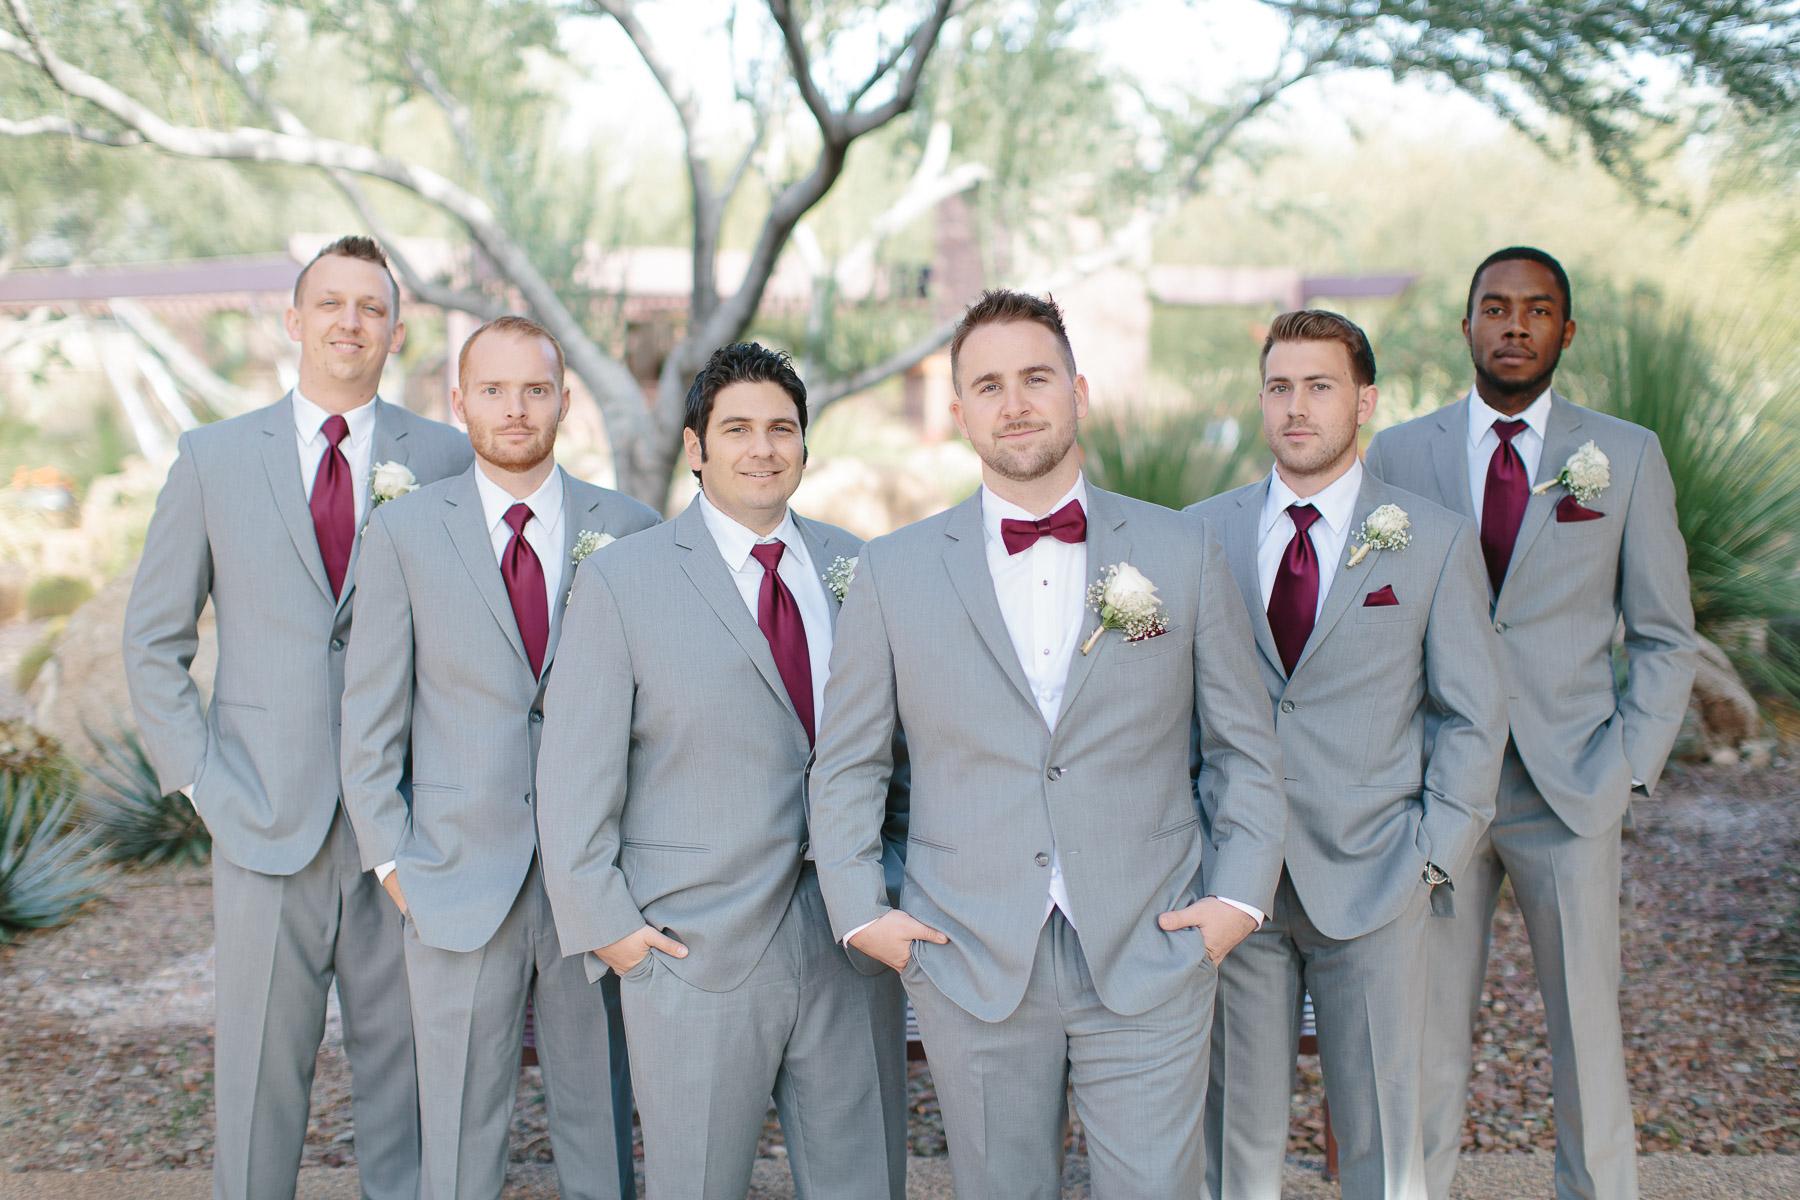 161210-Luxium-Weddings-Arizona-Matt-Jenny-Anthem-Golf-Country-Club-1004.jpg